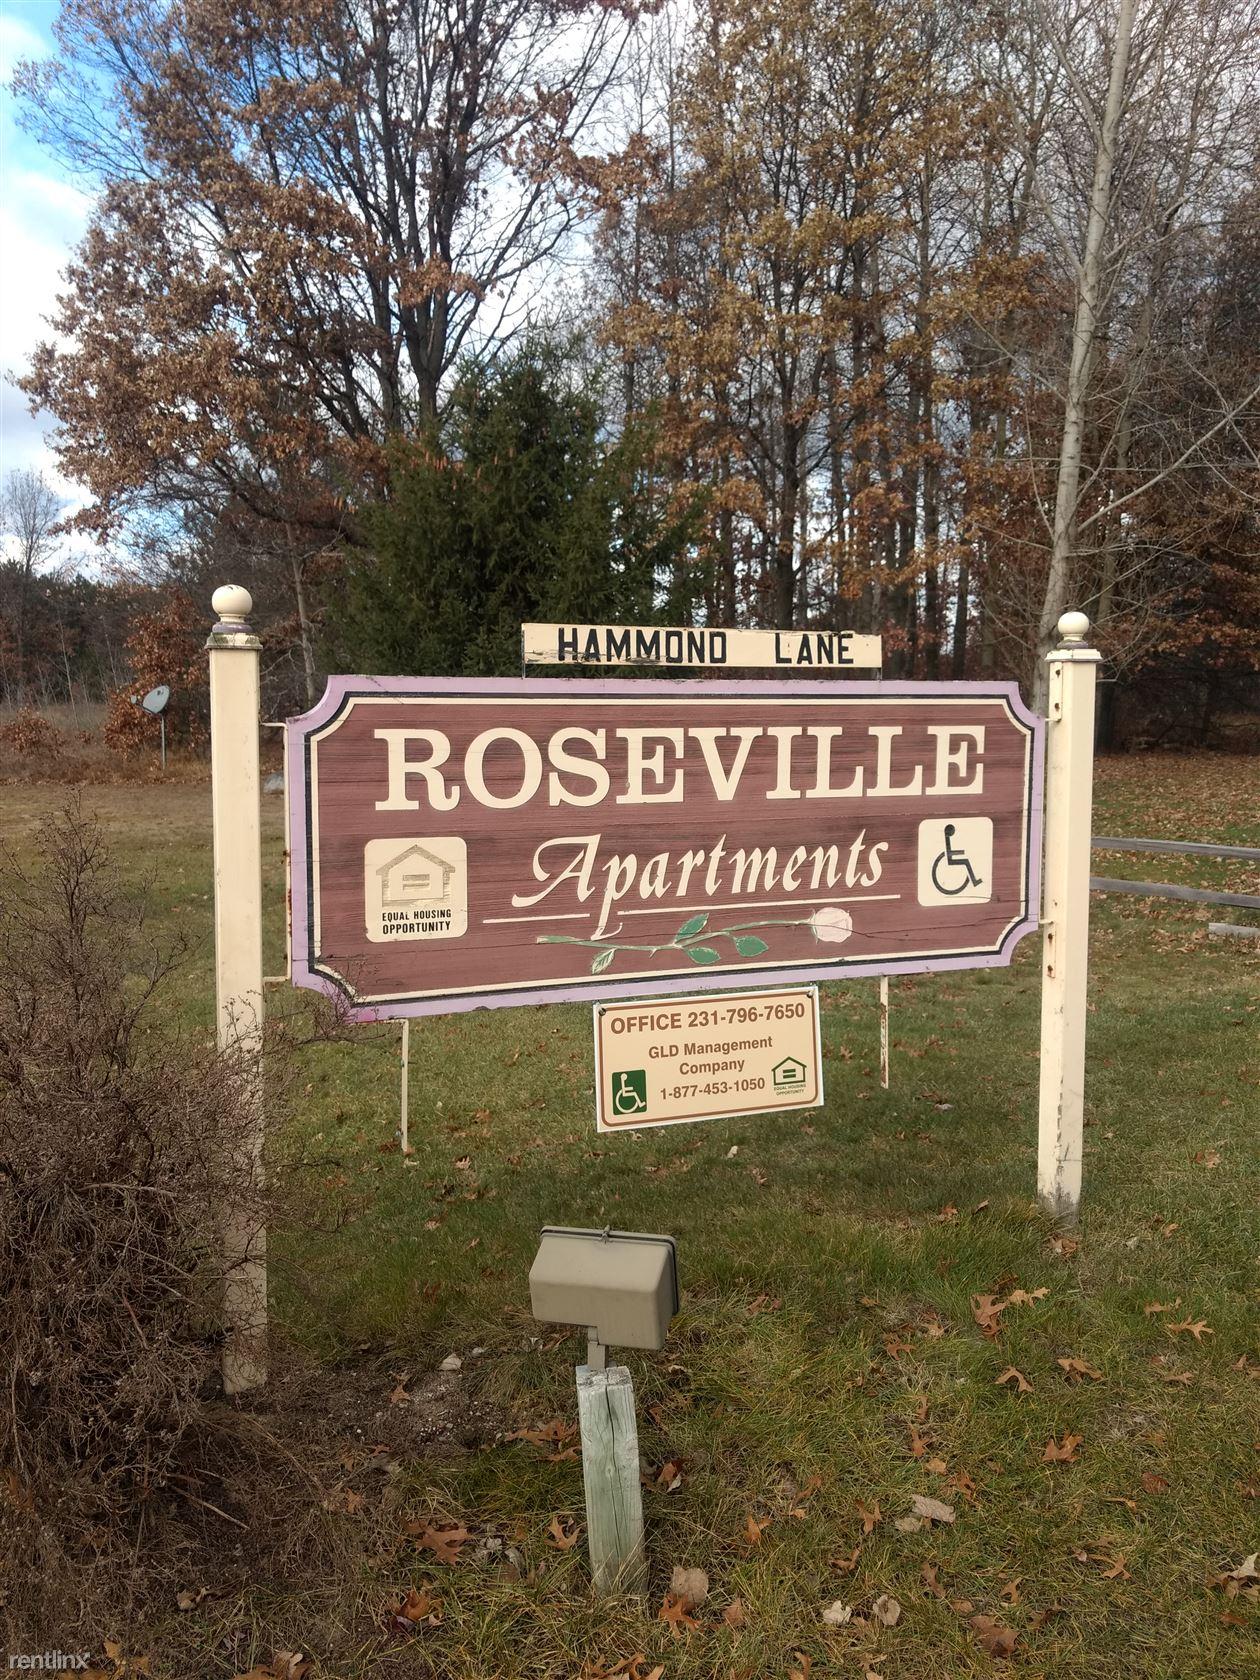 Roseville Apartments